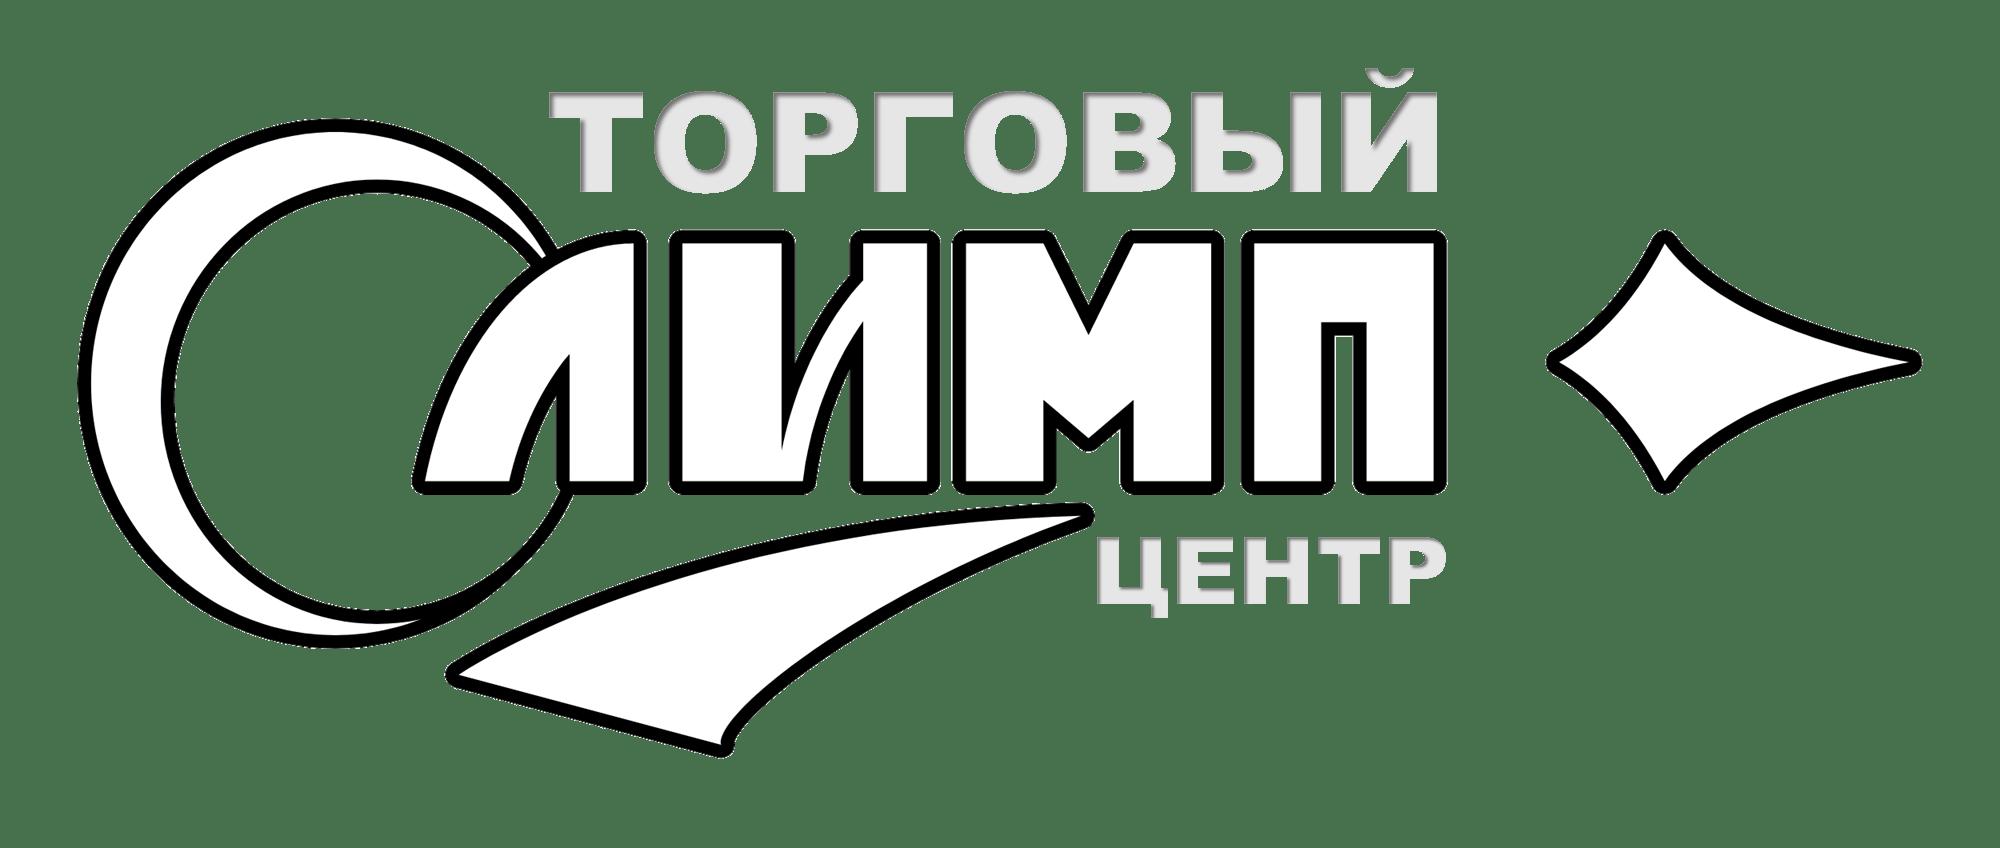 "Торговый центр ""ОЛИМП"""